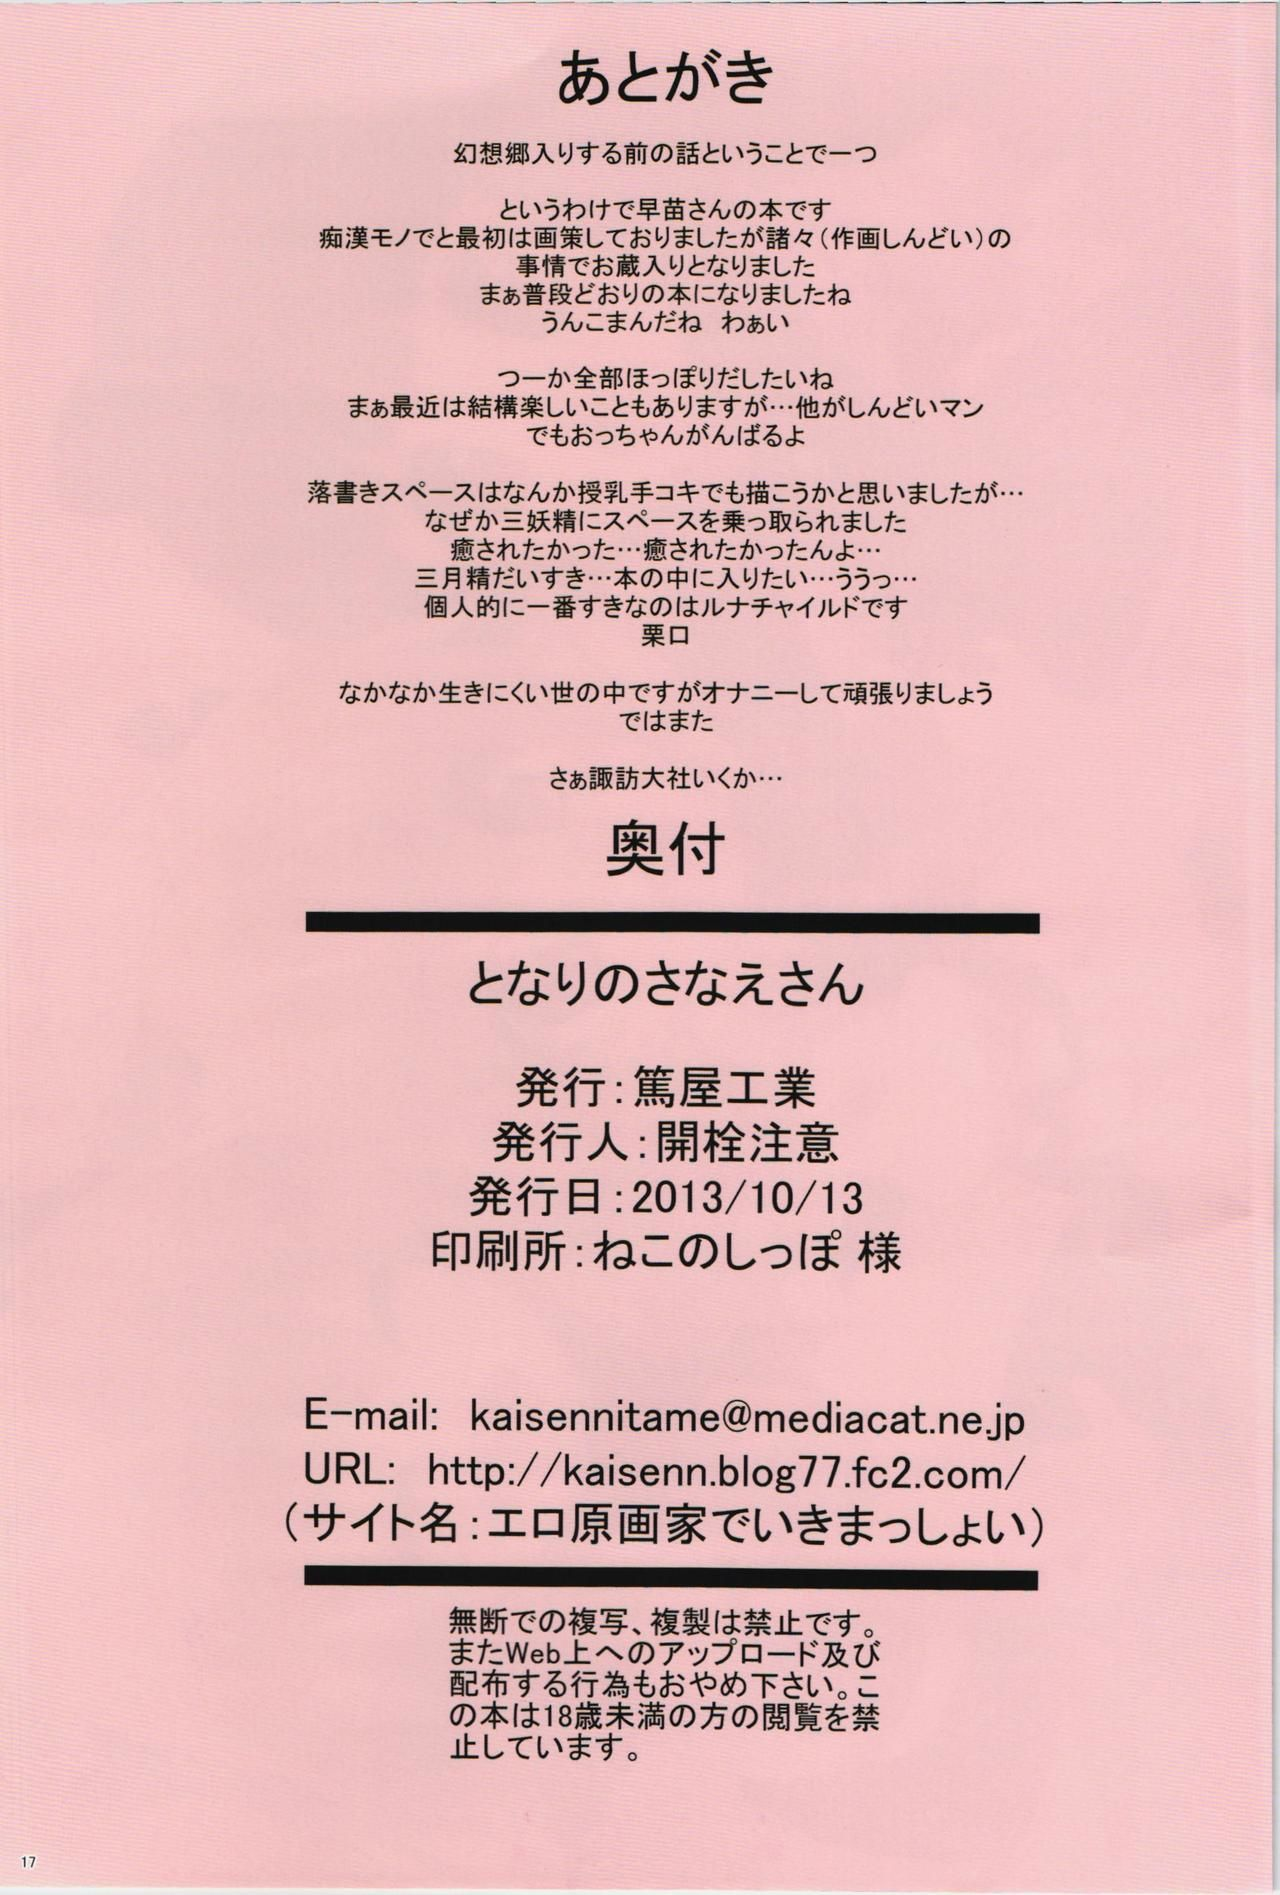 (Kouroumu 9) Atsuya Kougyou (Kaisen Chuui) Tonari no Sanae-san - My Neighbor Sanae (Touhou Project) {rampantserenity}